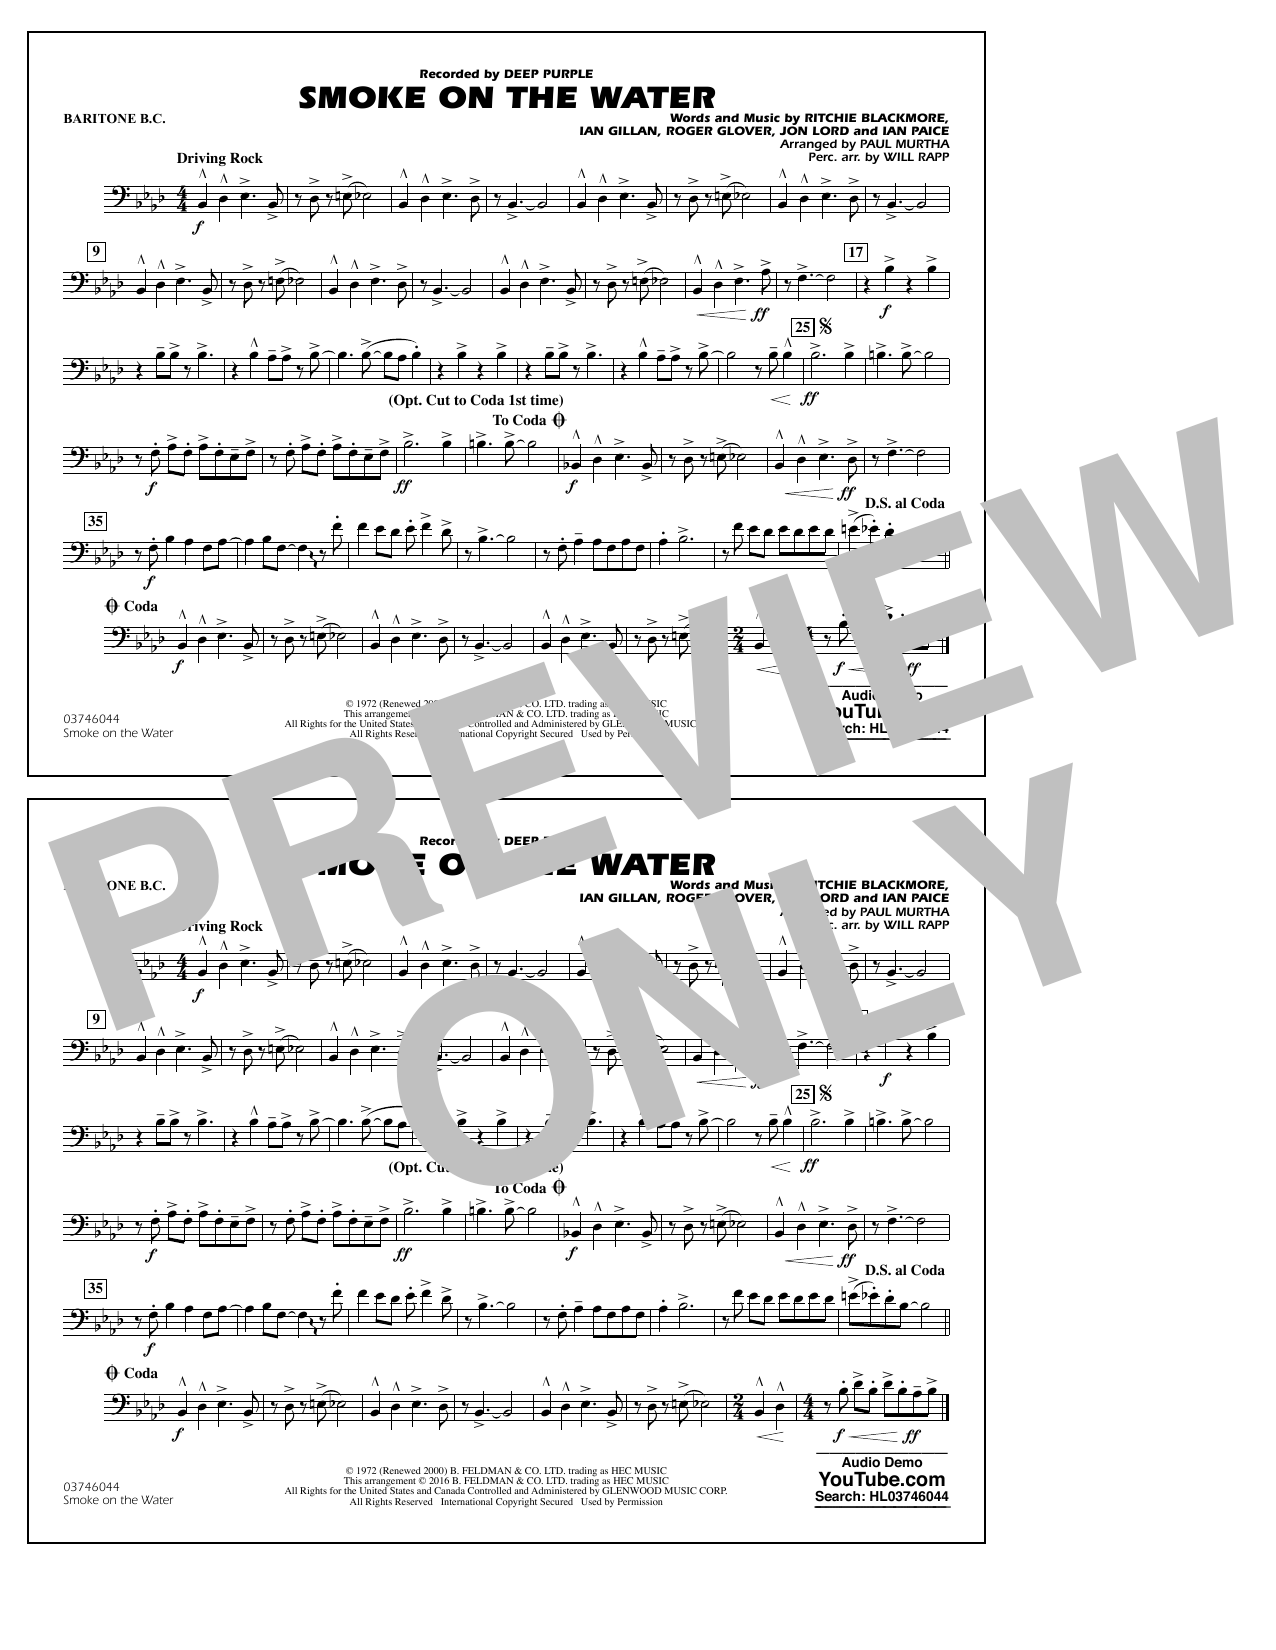 Paul Murtha Smoke on the Water - Baritone B.C. sheet music notes and chords. Download Printable PDF.